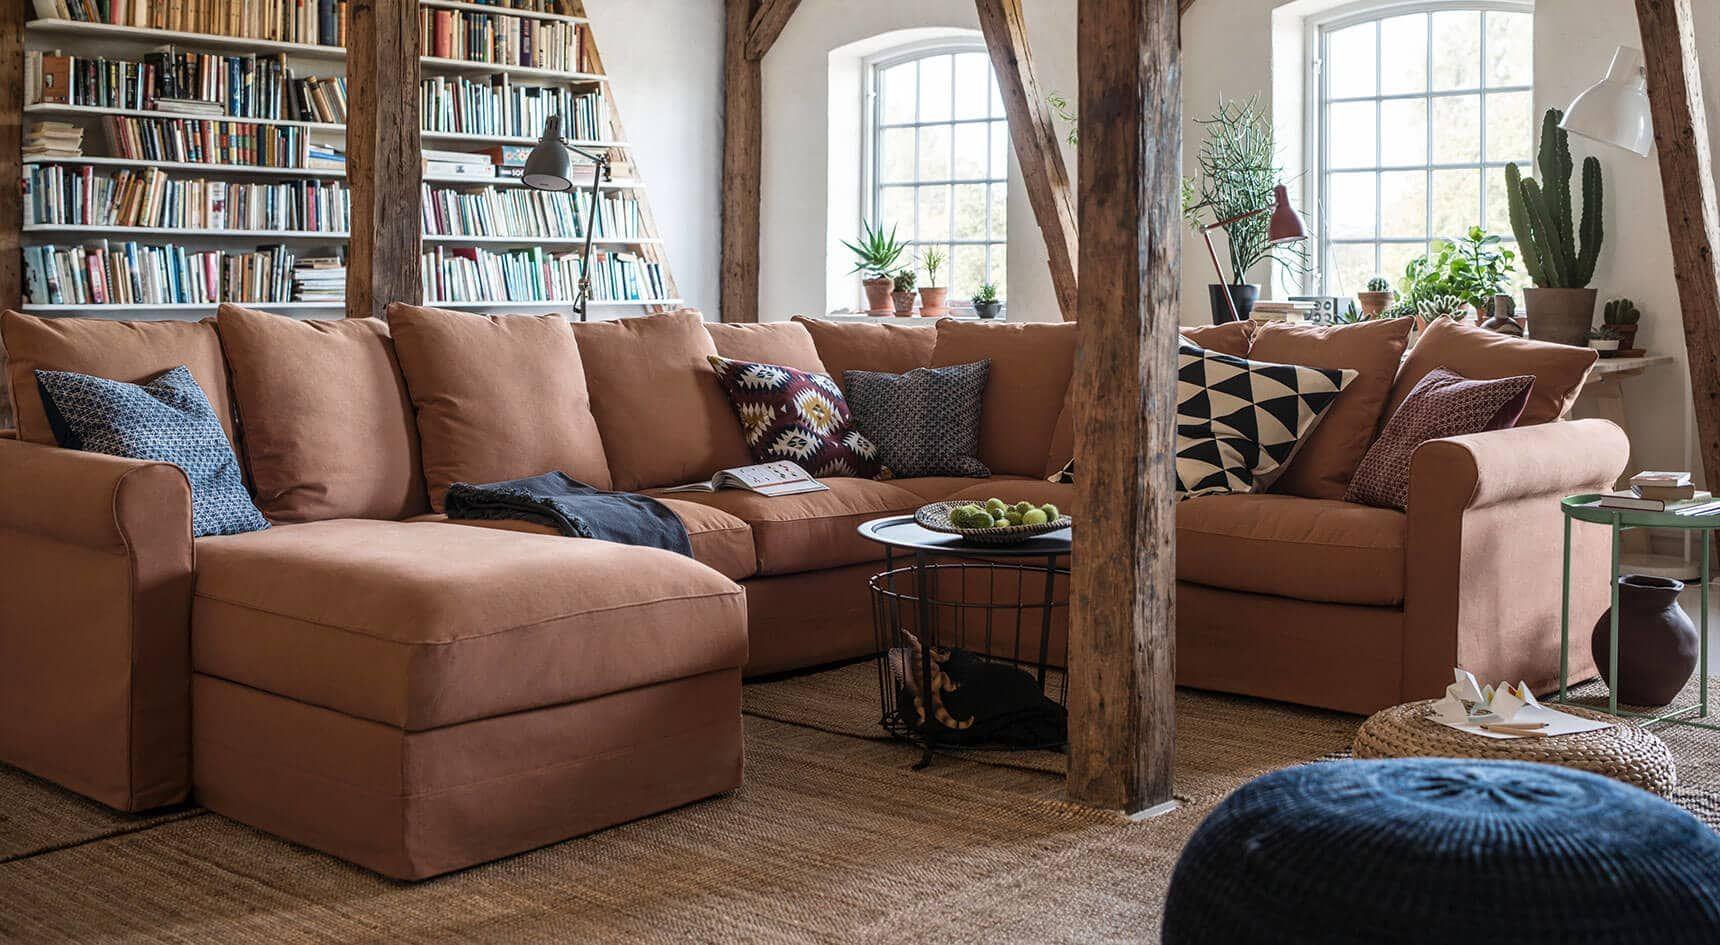 Introducing the versatile new GRÖNLID sectional sofa